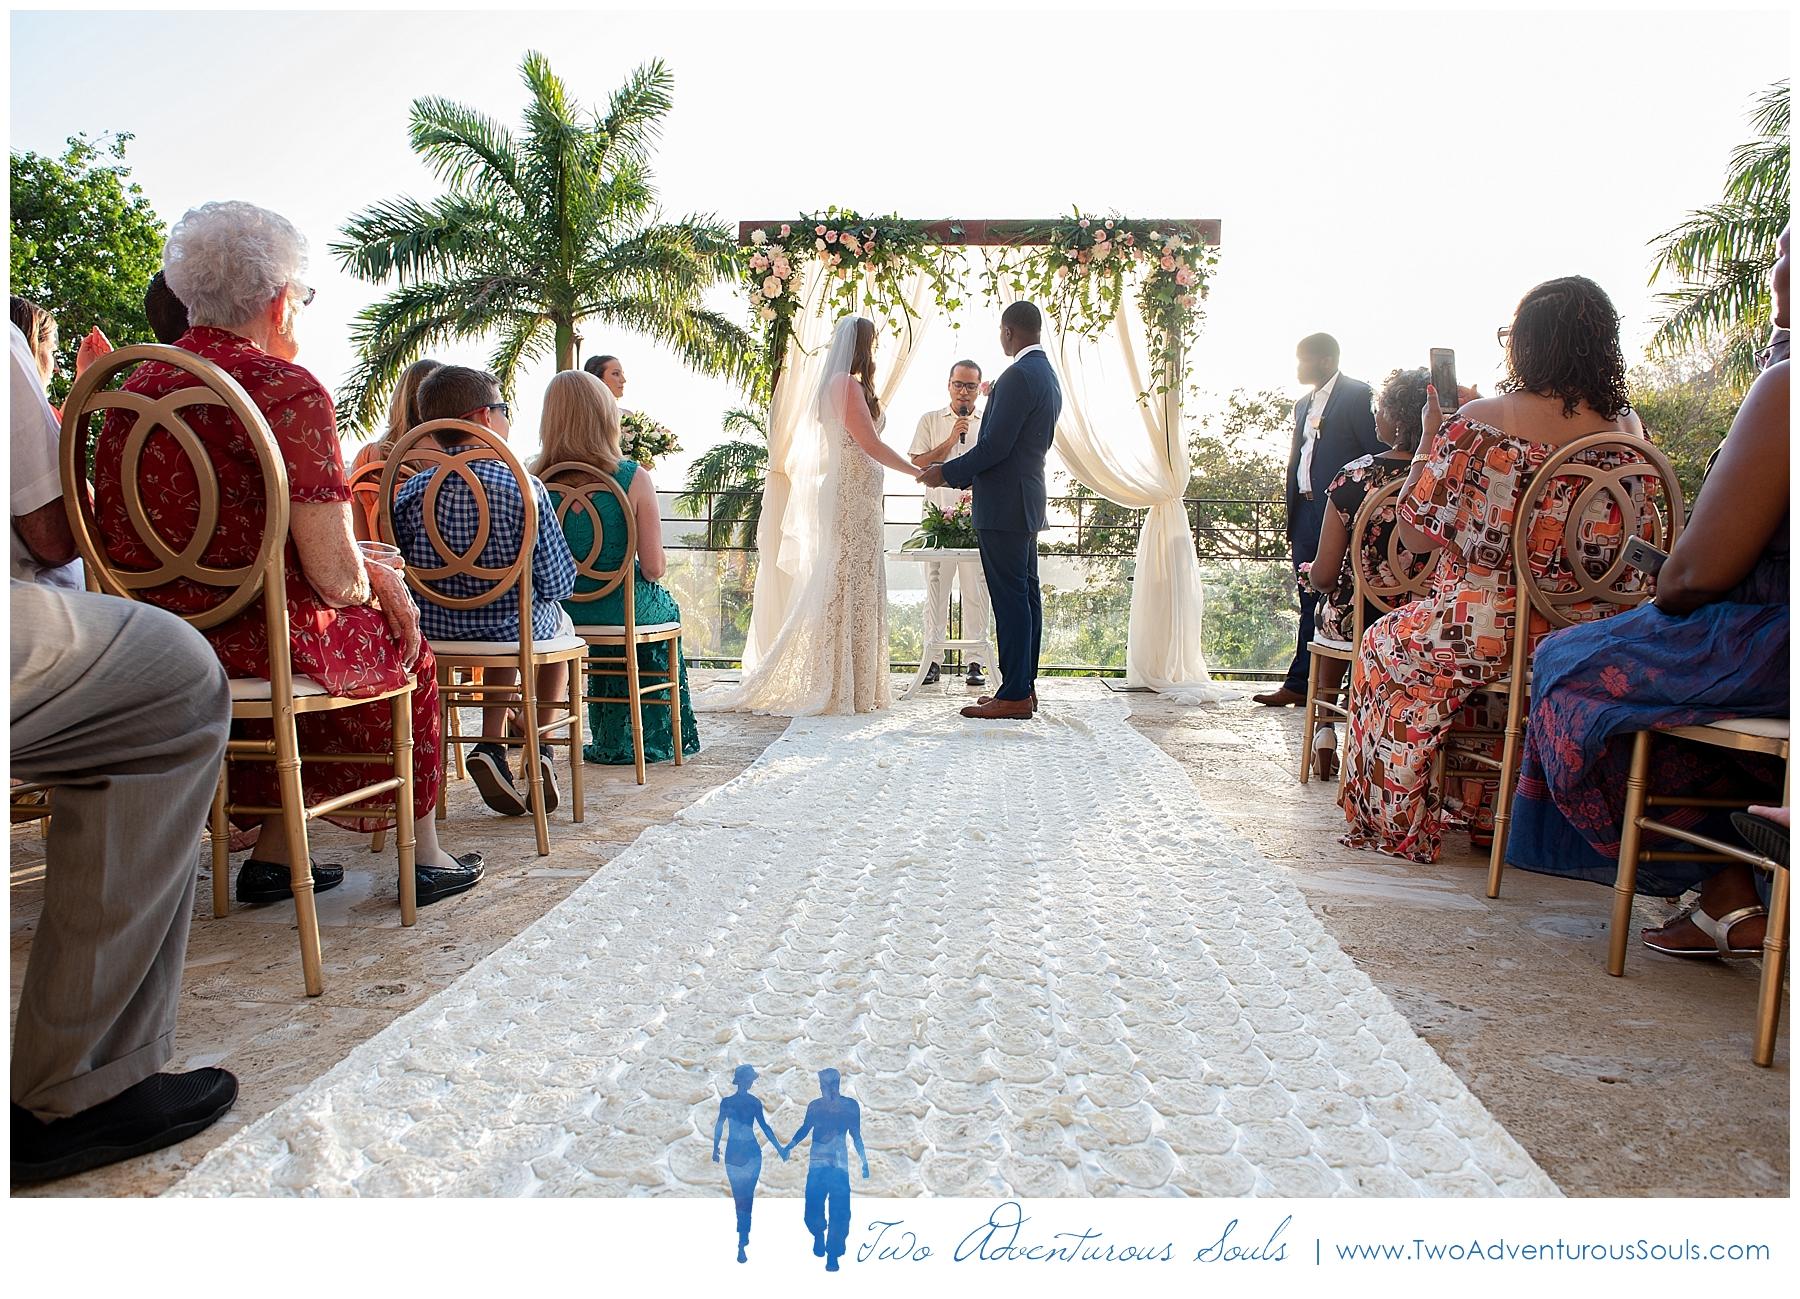 Costa Rica Wedding Photographers, Dreams las Mareas Wedding, Destination Wedding Photographers, Two Adventurous Souls - 022219_0021.jpg